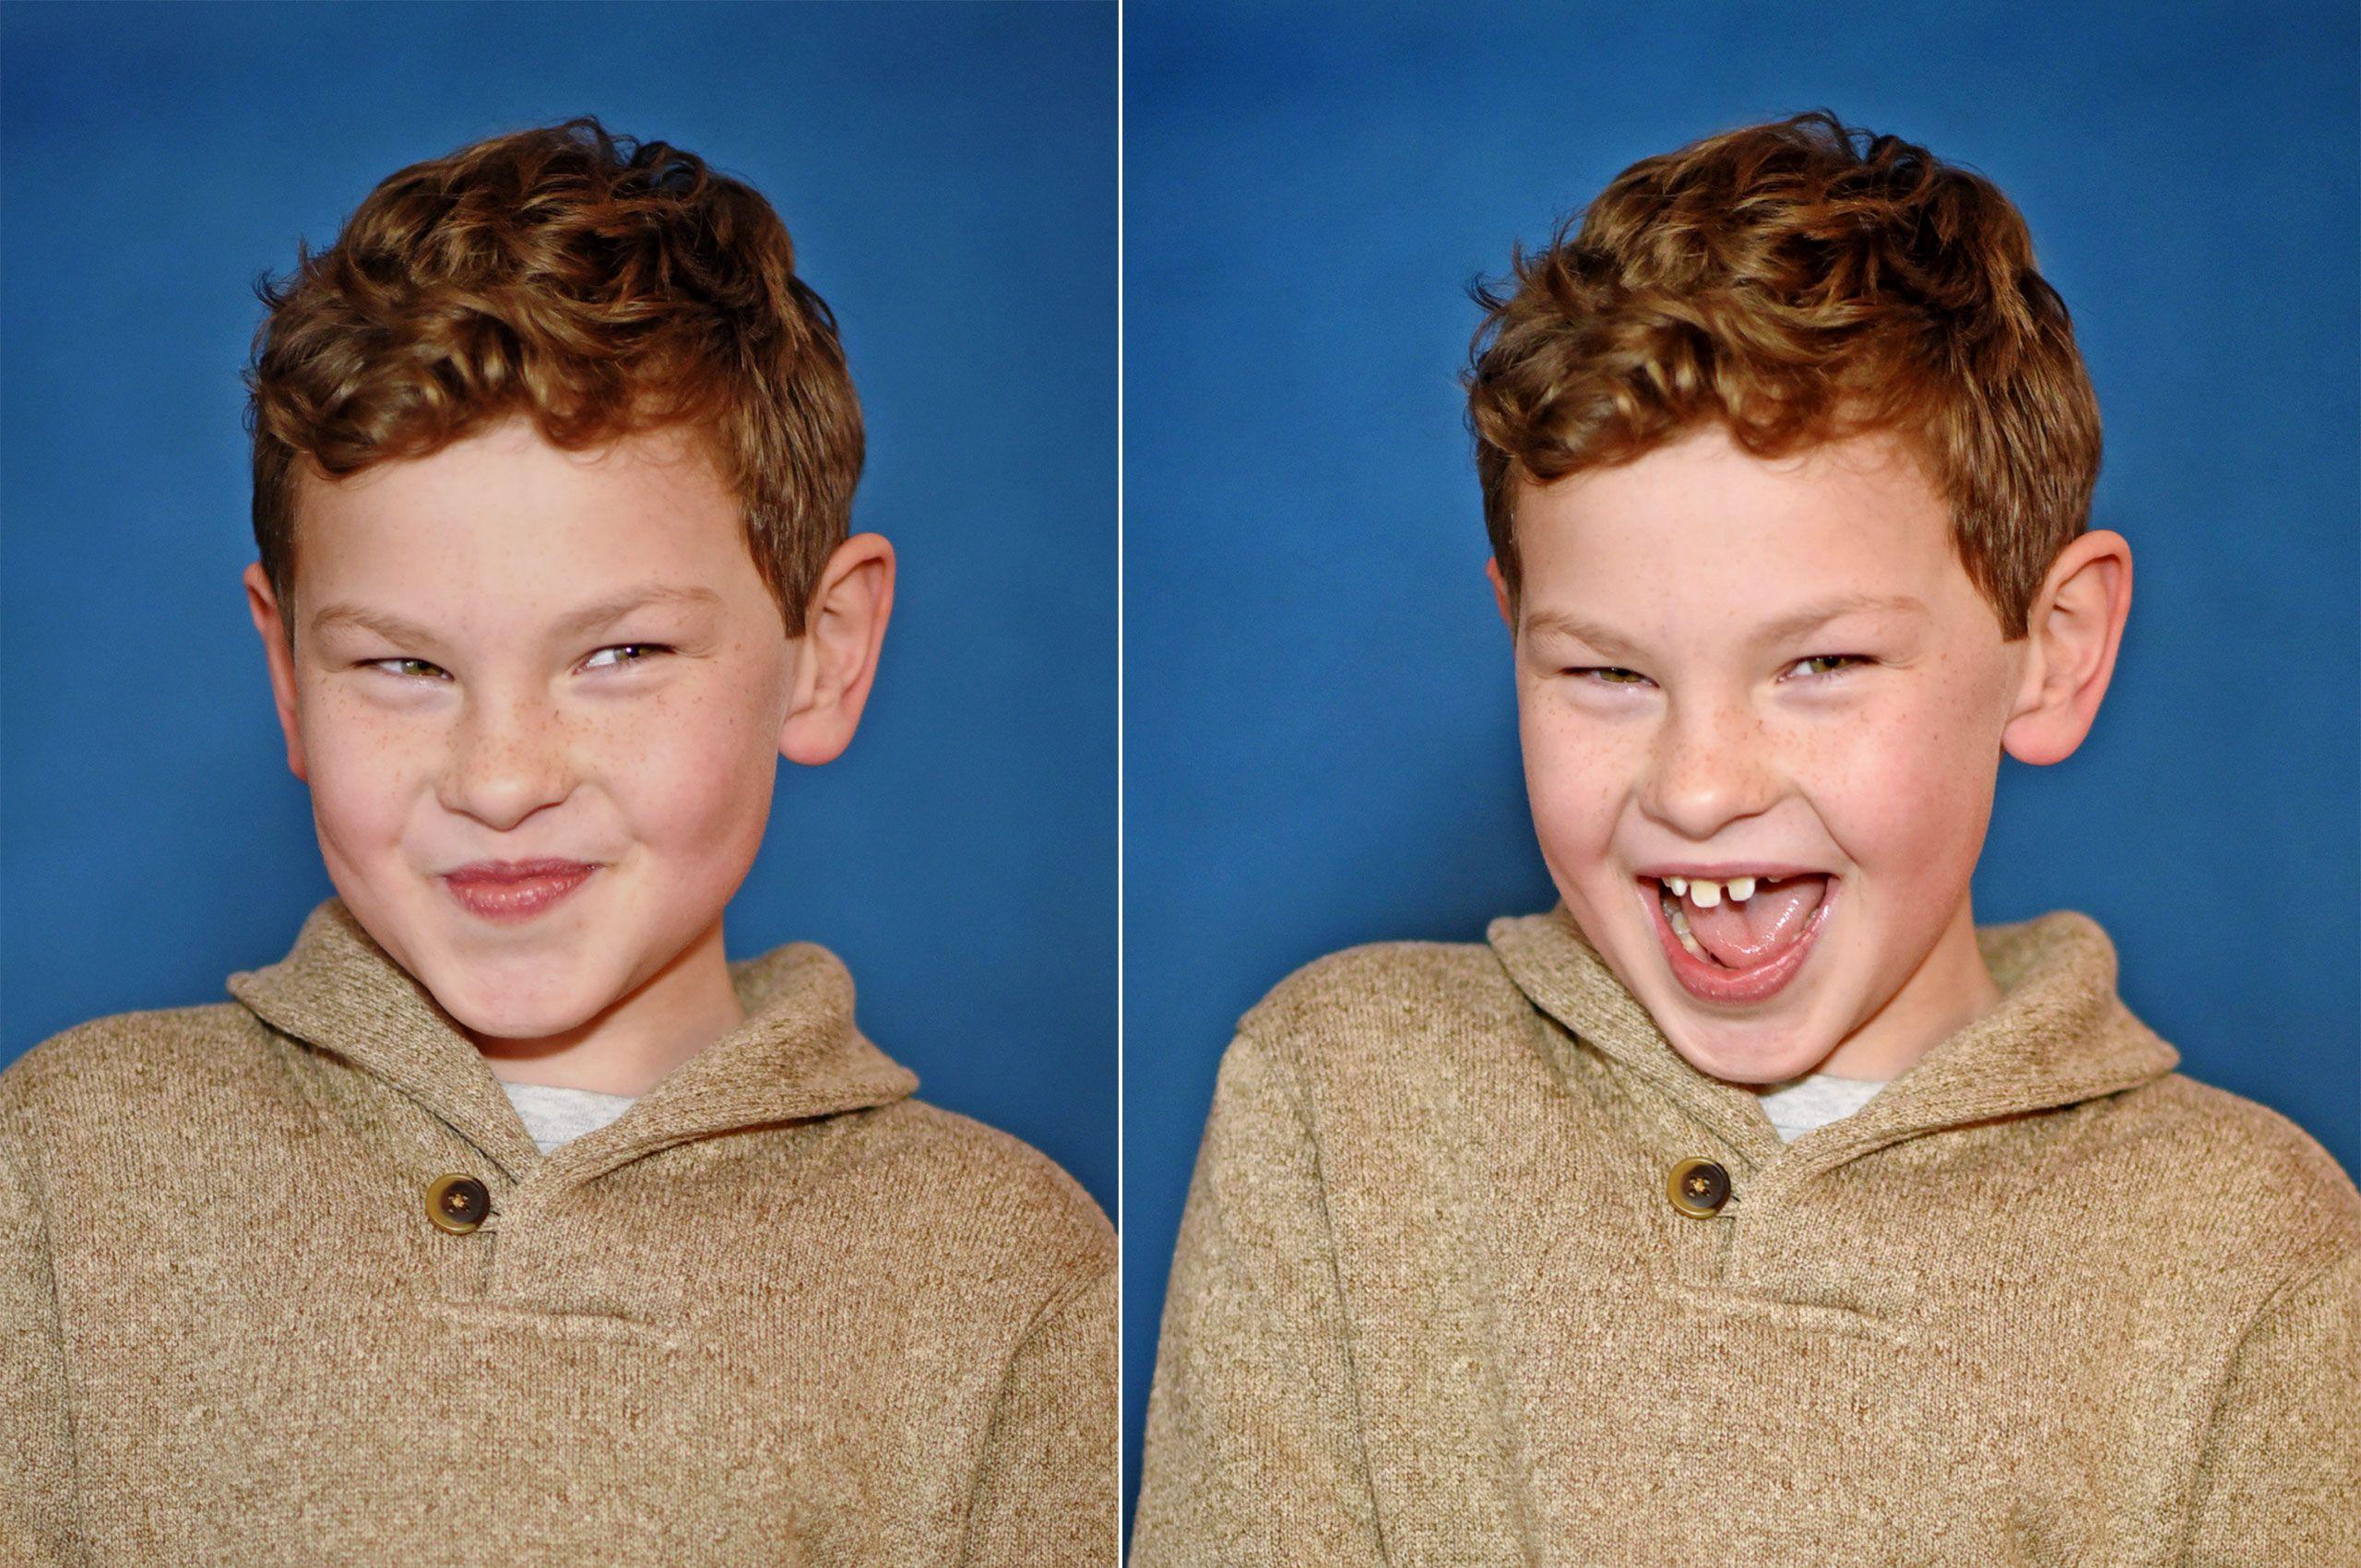 Chicago Headshot photographer